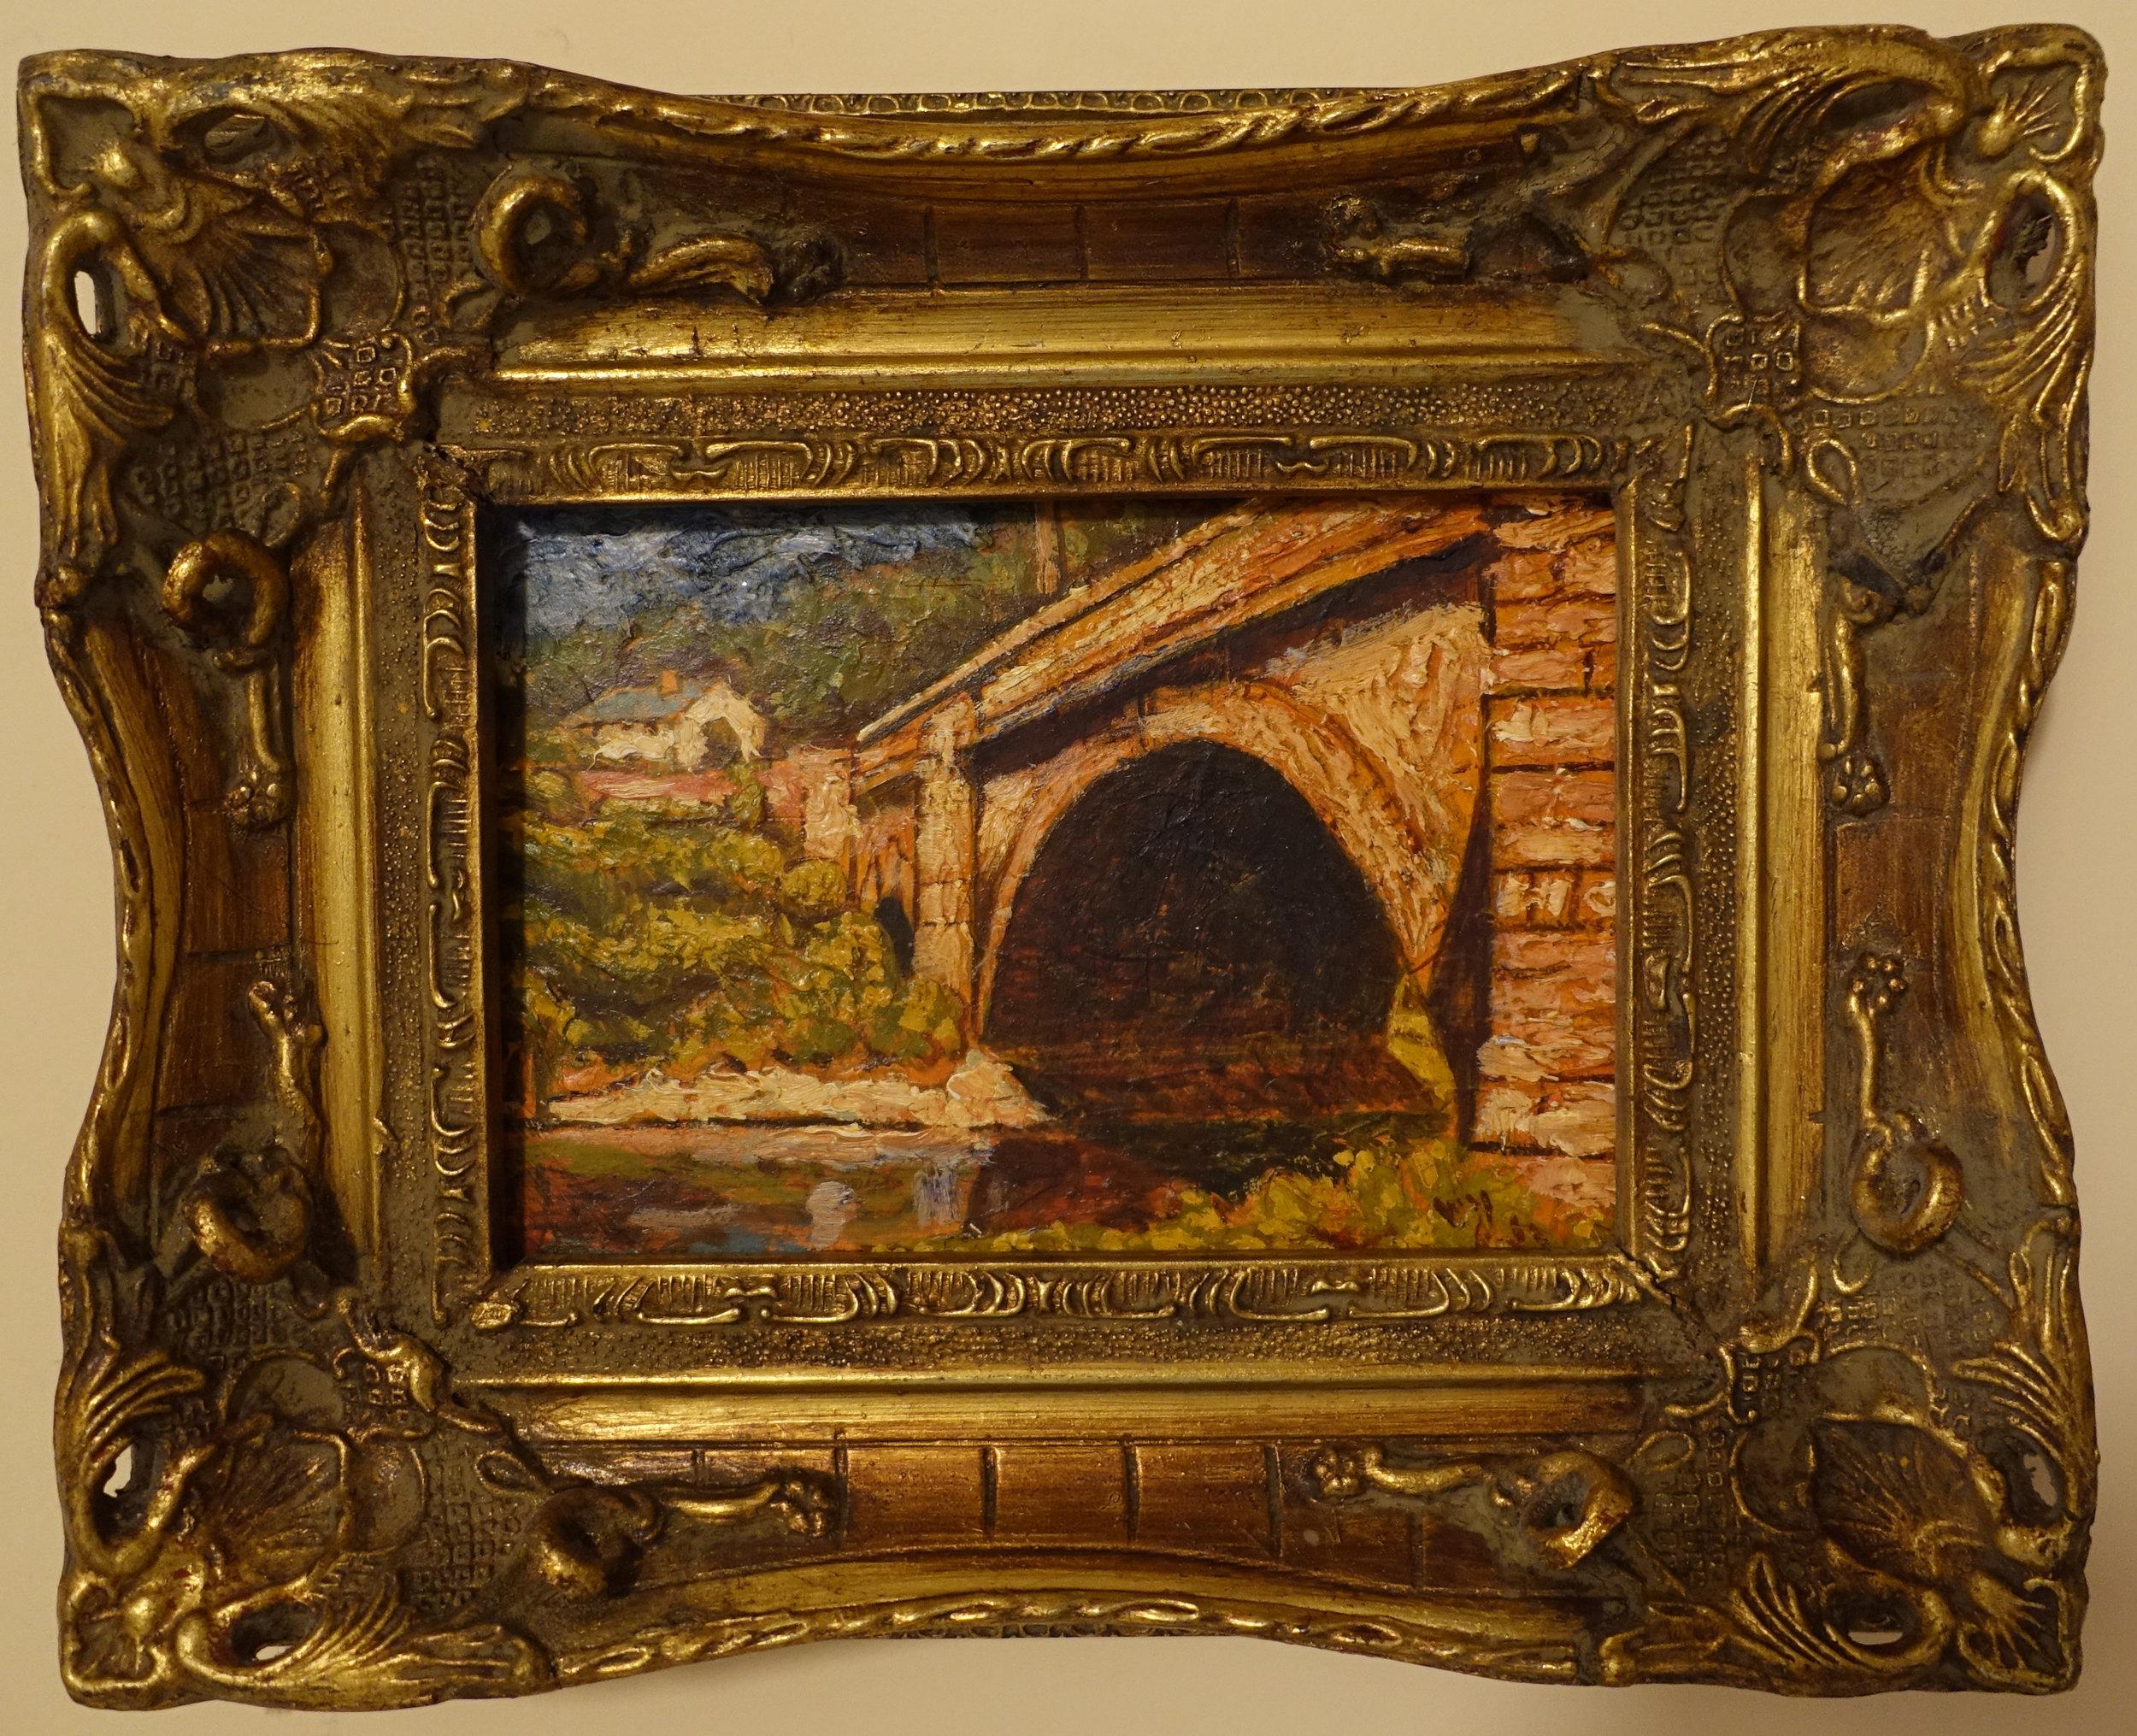 b painting of bridge copes.jpg